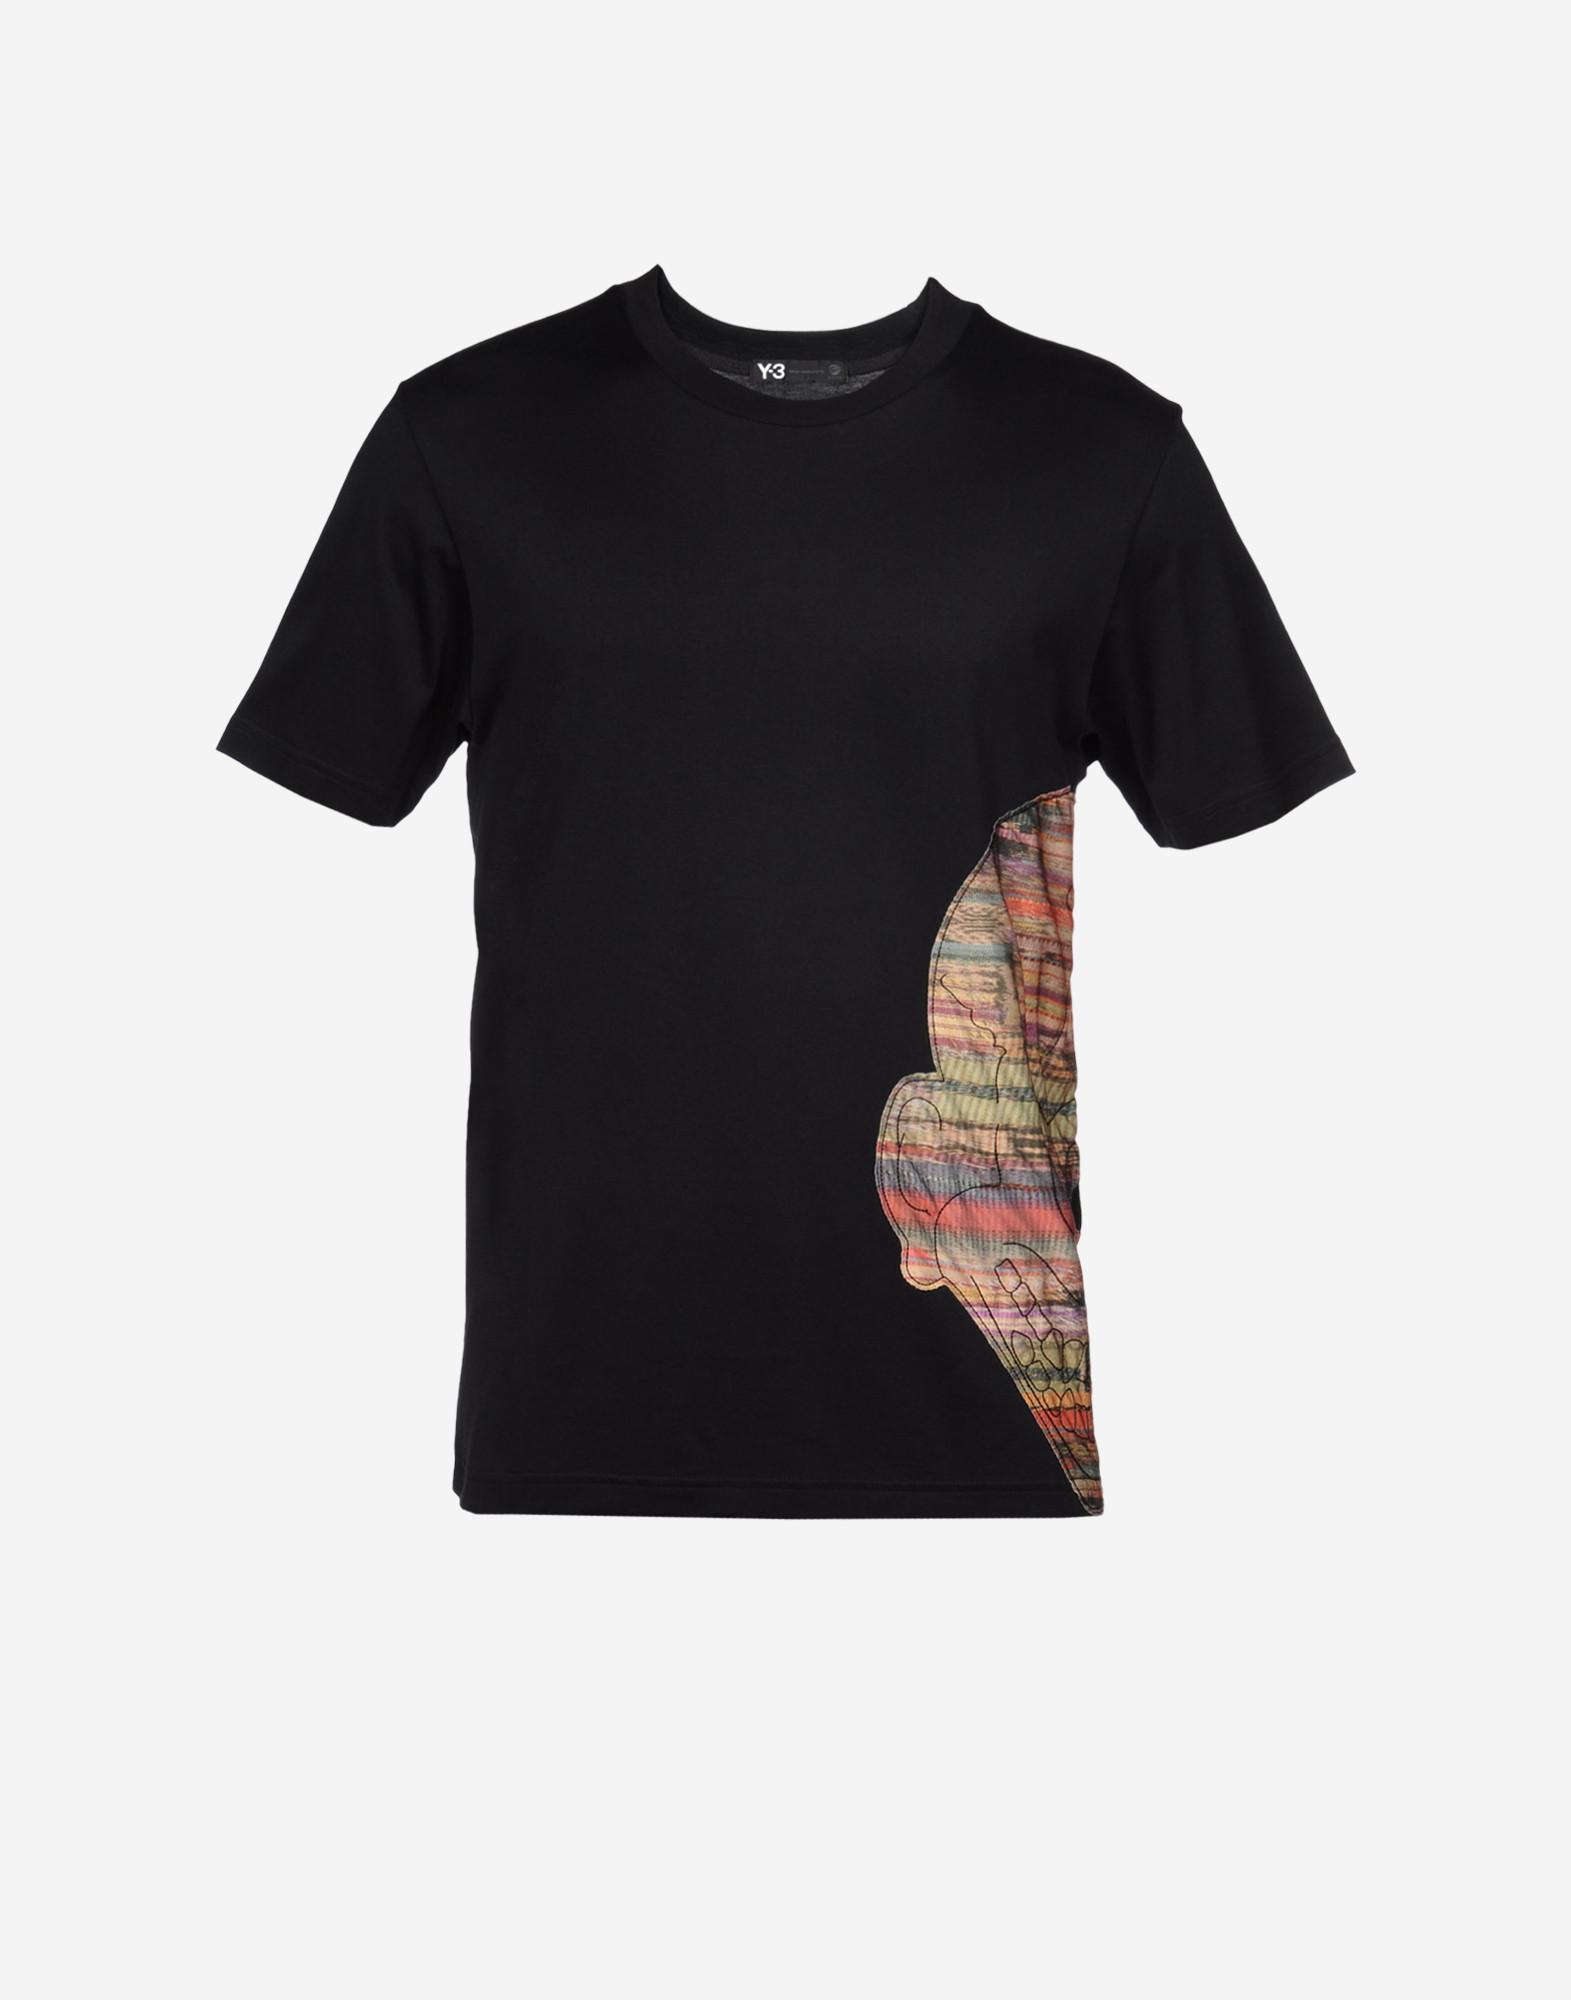 c43659b16  Y 3 Skull Tee Short Sleeve t Shirts | Adidas Y-3 Official Site